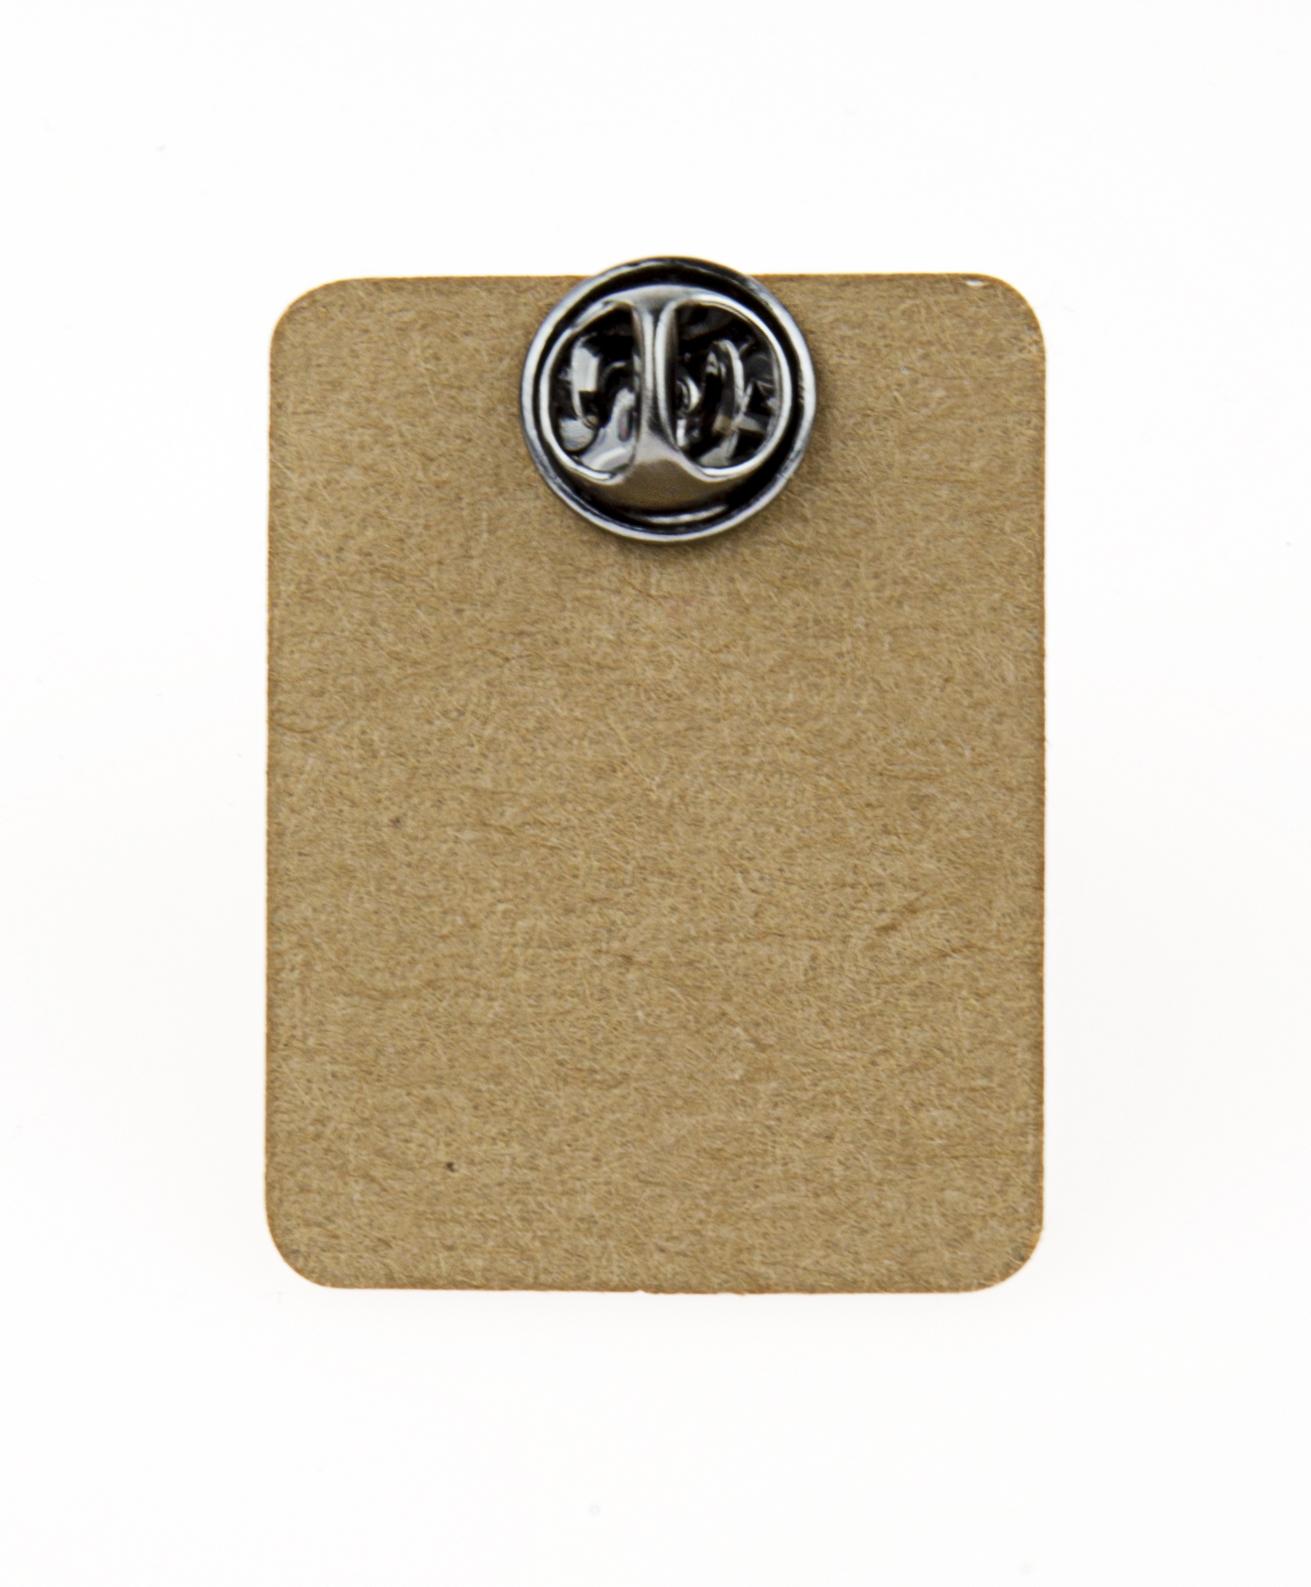 Metal Unicorn Heart Enamel Pin Badge